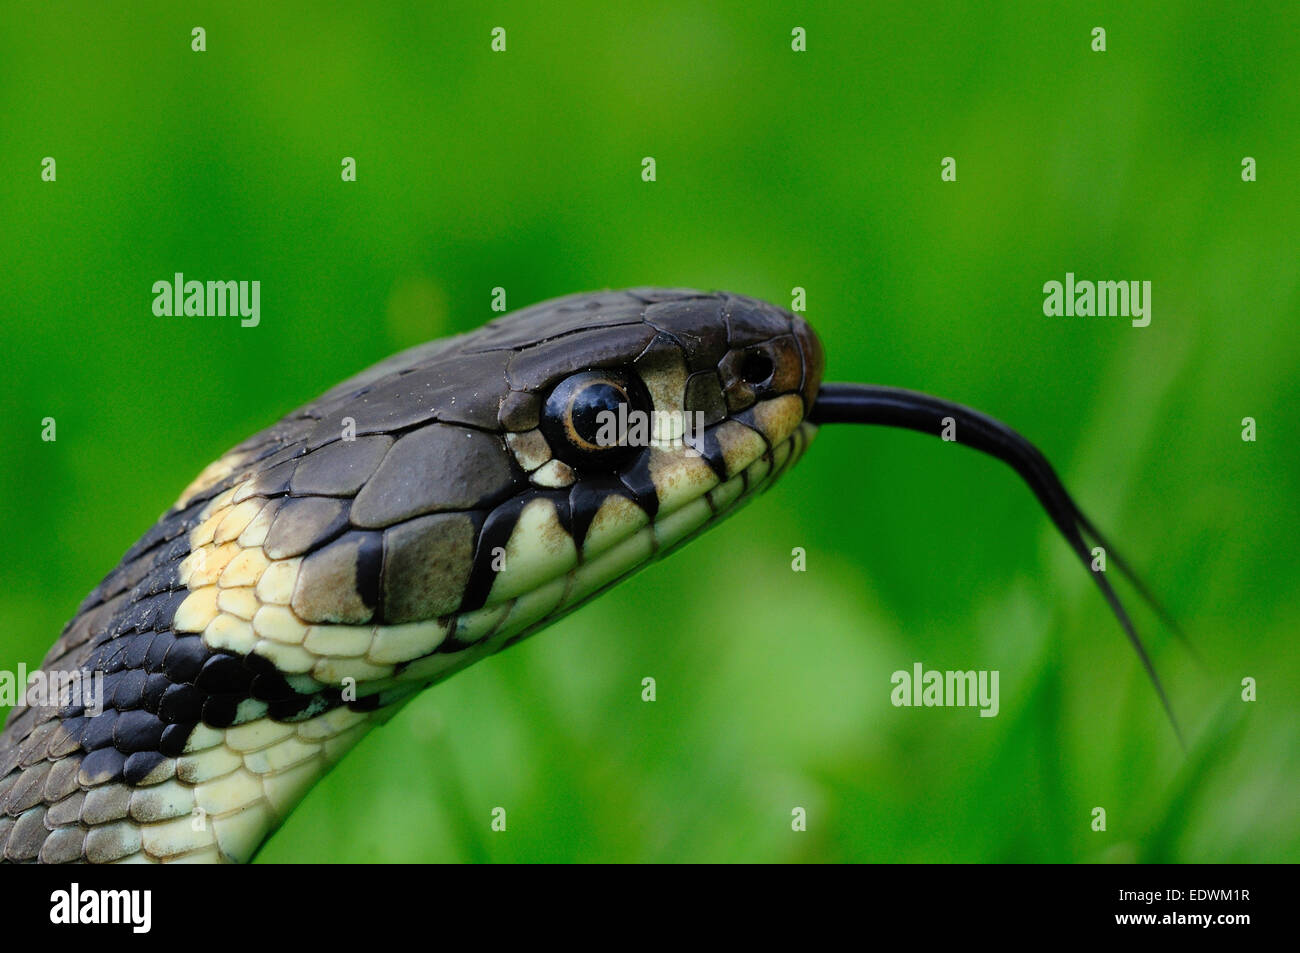 Grass snake flicking its tongue UK - Stock Image